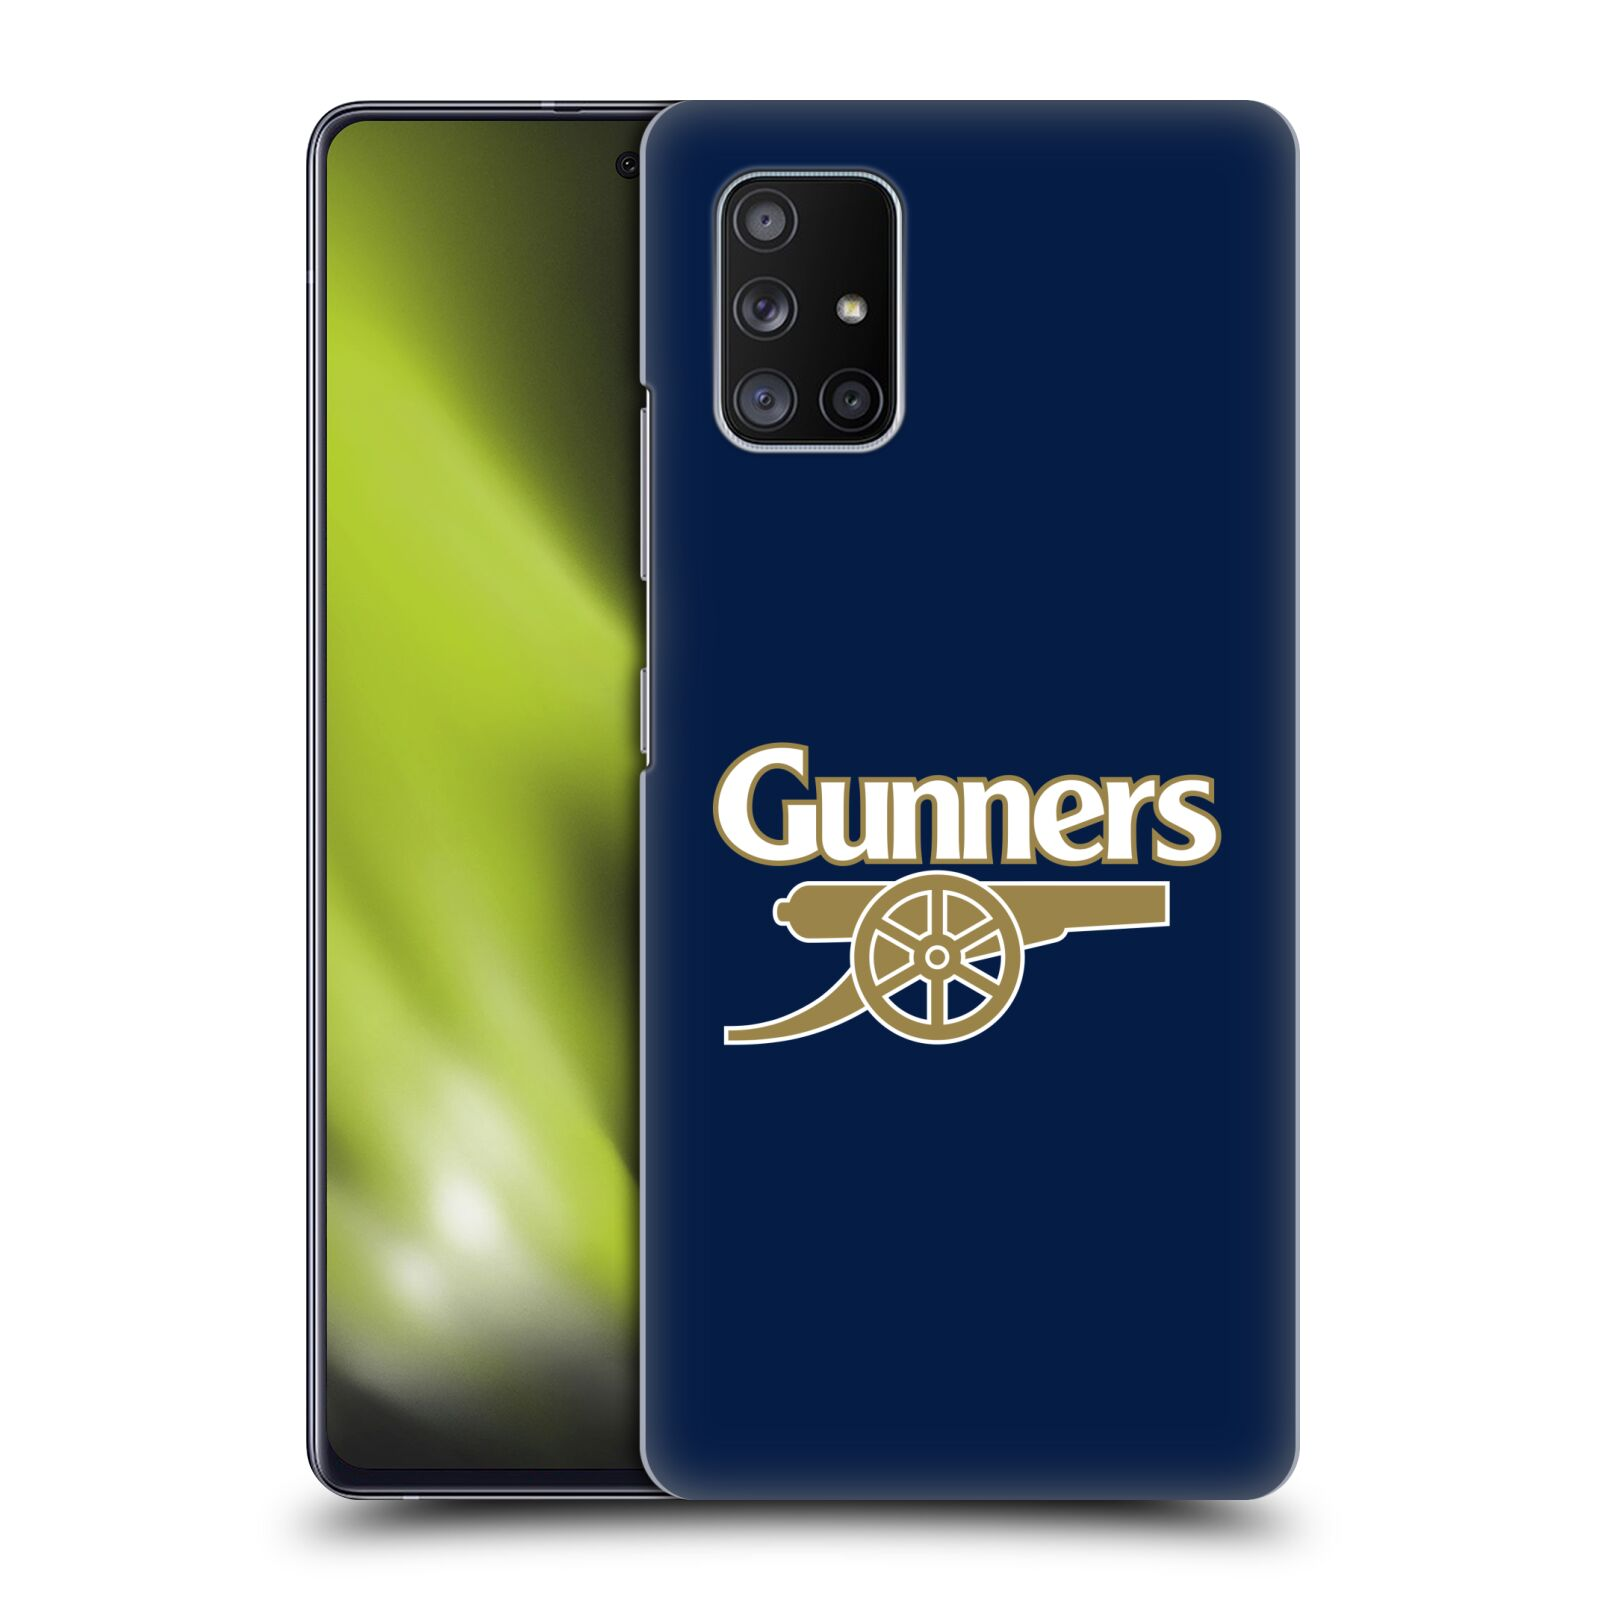 Plastové pouzdro na mobil Samsung Galaxy A51 5G - Head Case - Arsenal FC - Gunners